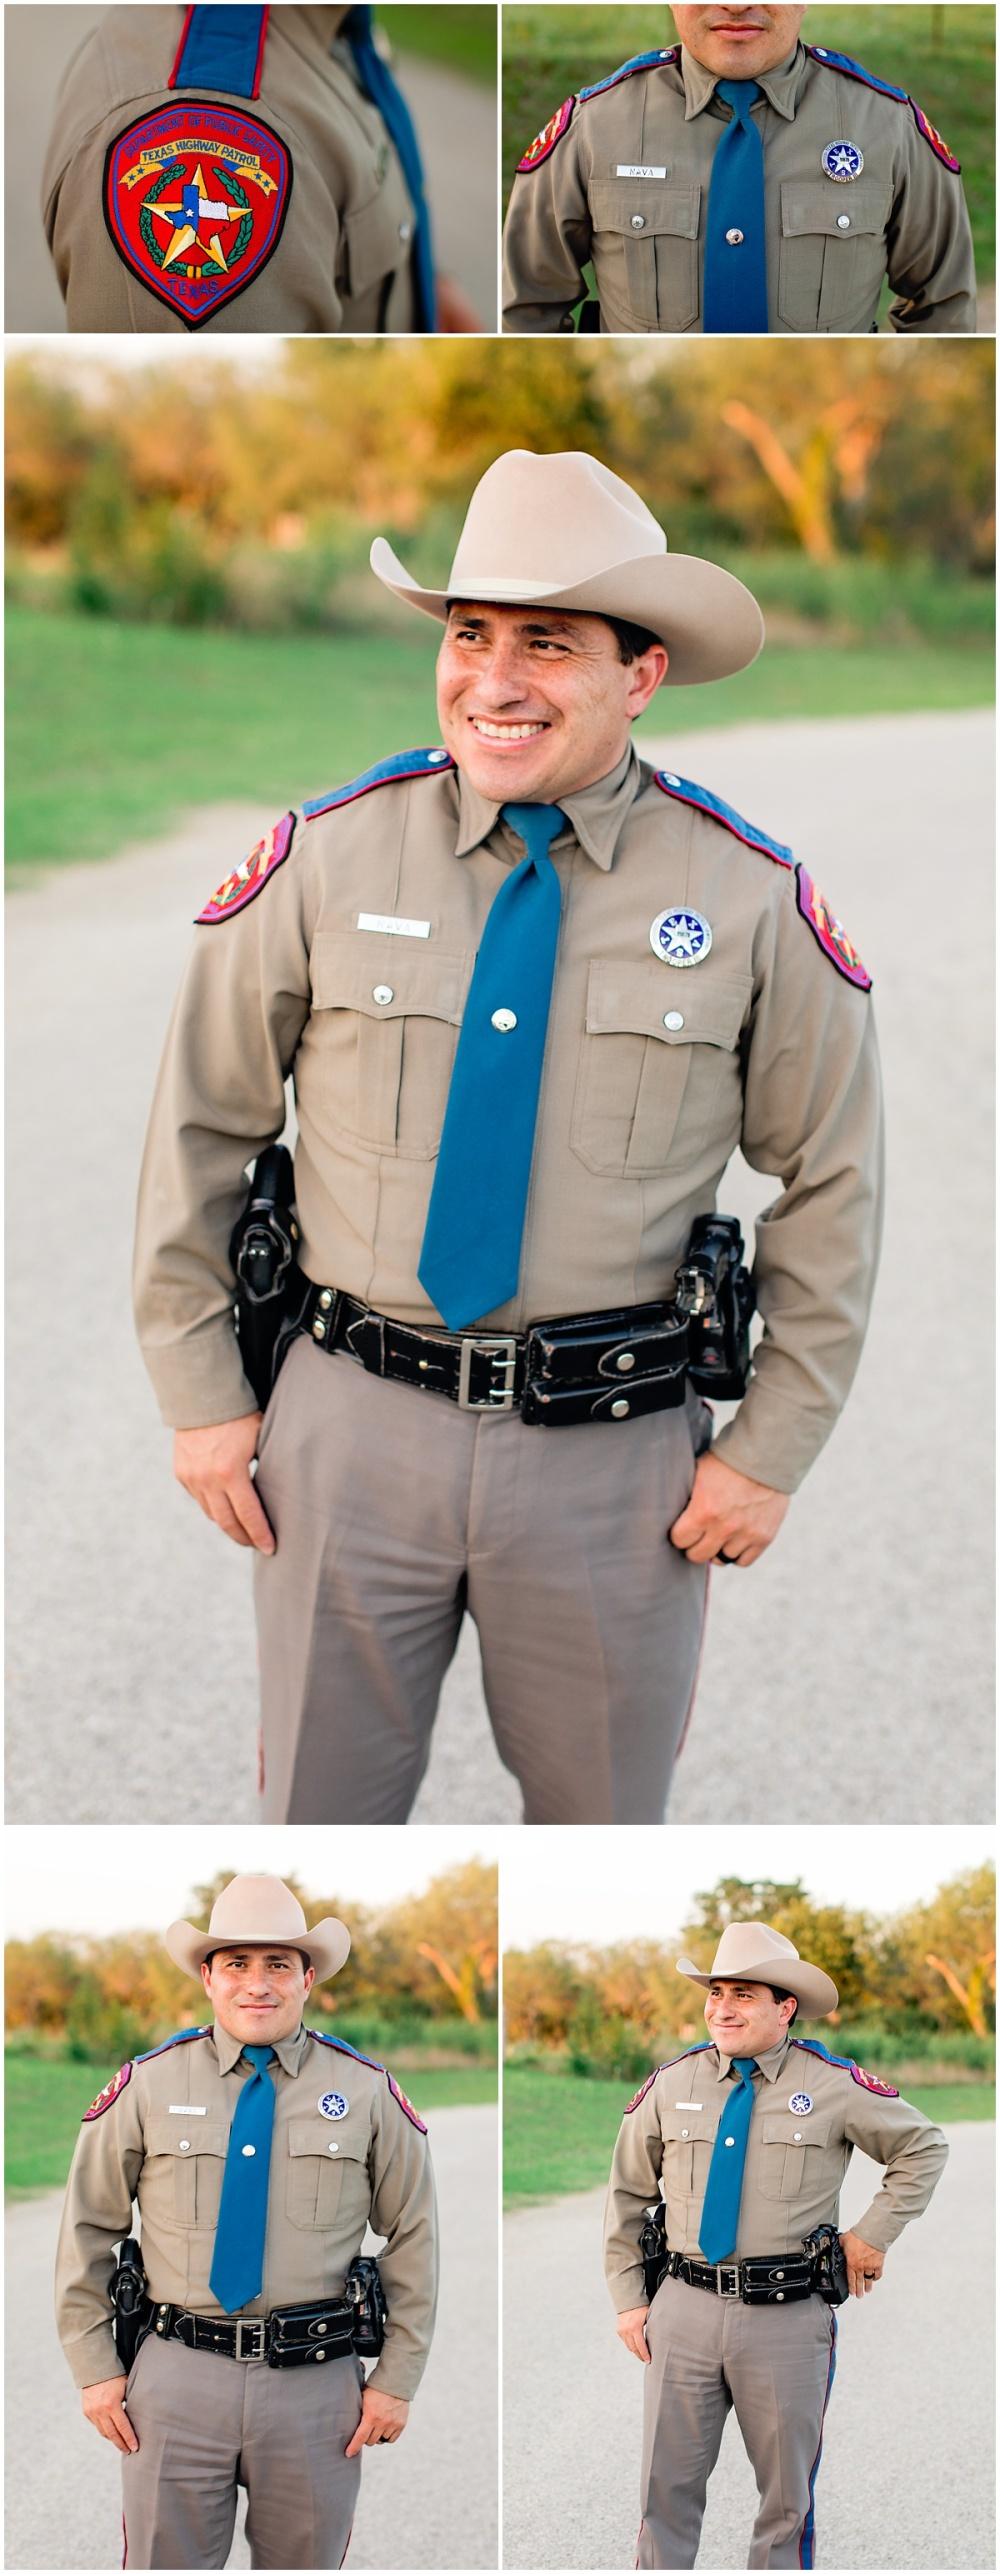 Portraits-State-Trooper-Photos-San-Antonio-Hill-Country-Texas-Carly-Barton-Photography_0007.jpg